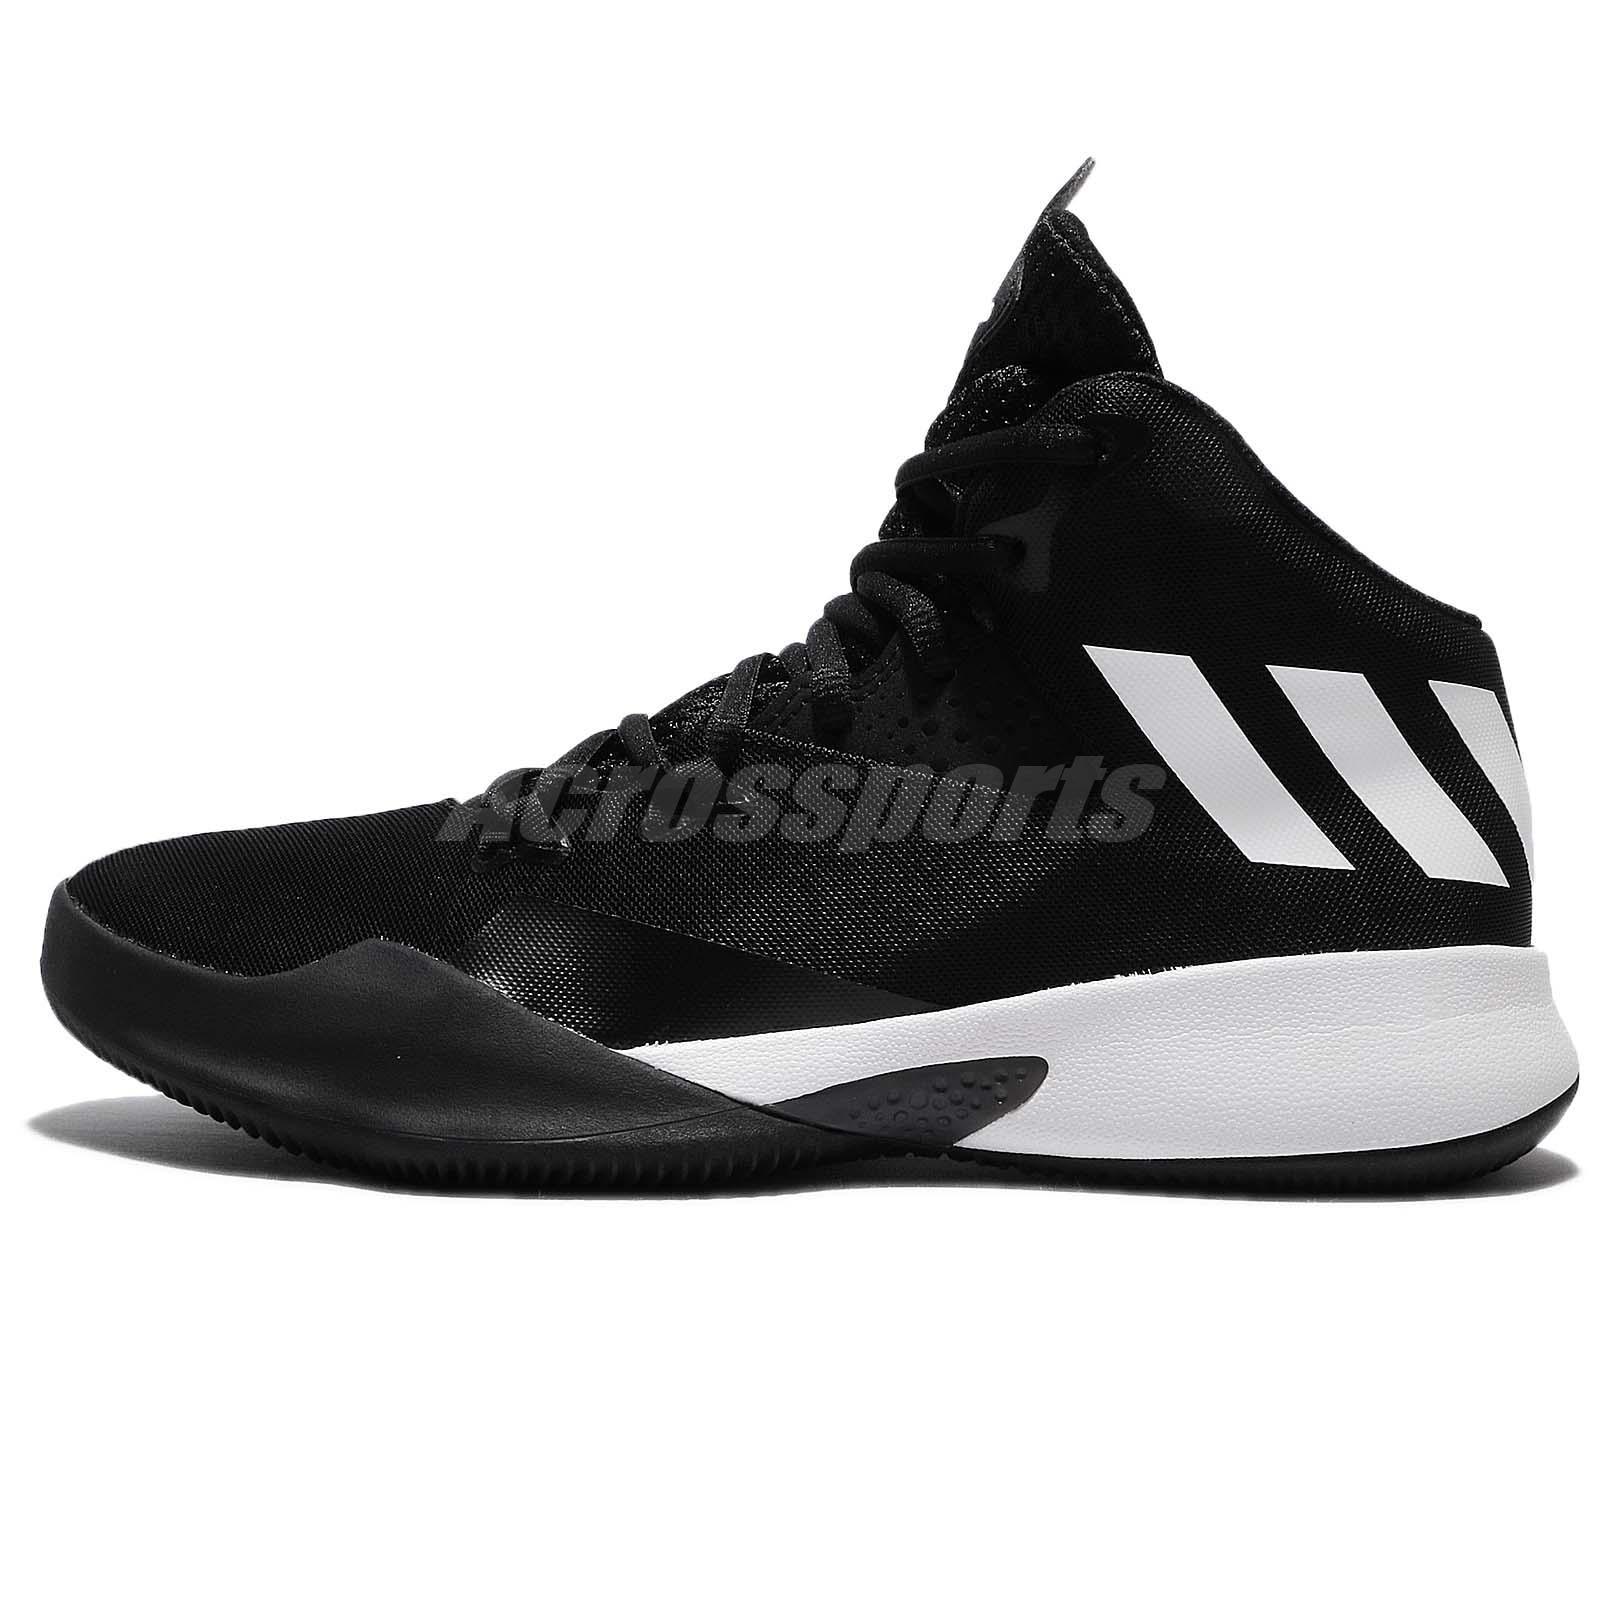 4b144fa594d0 ... promo code for adidas dual threat 2017 j black white kids women junior basketball  shoes by4442